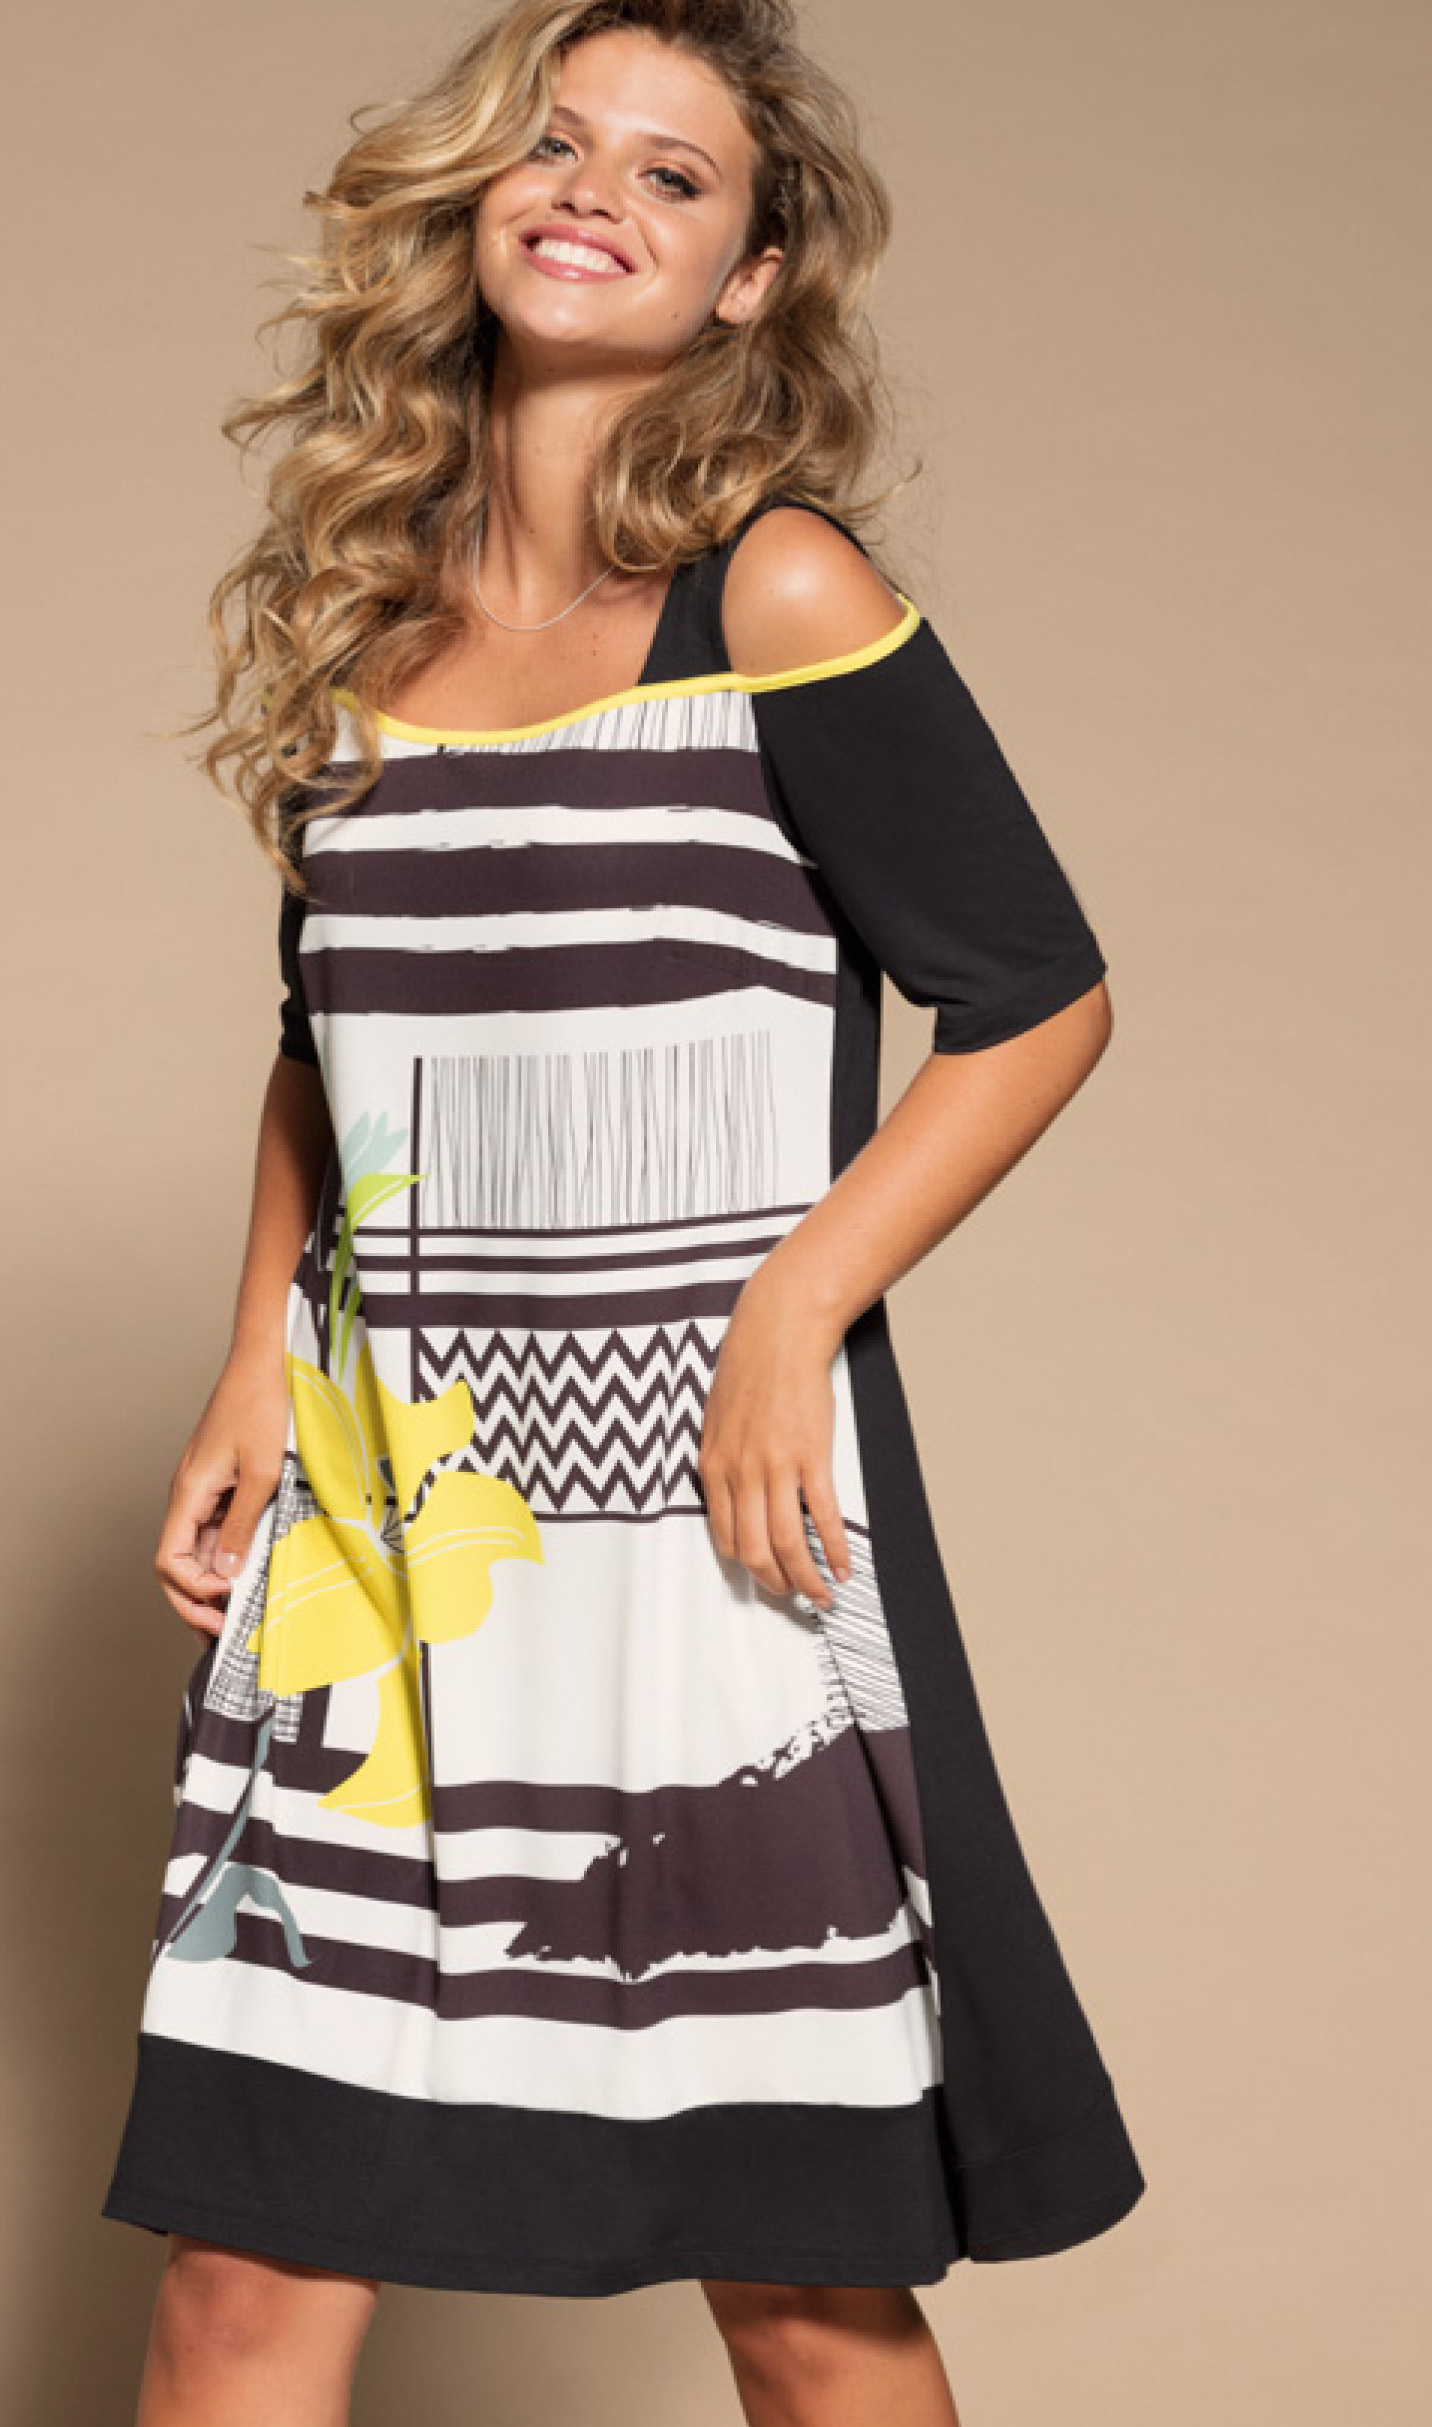 Maloka: Lemon Lime Marble Cold Shoulder Dress/Tunic (2 Left!) MK_NAEMI_N1